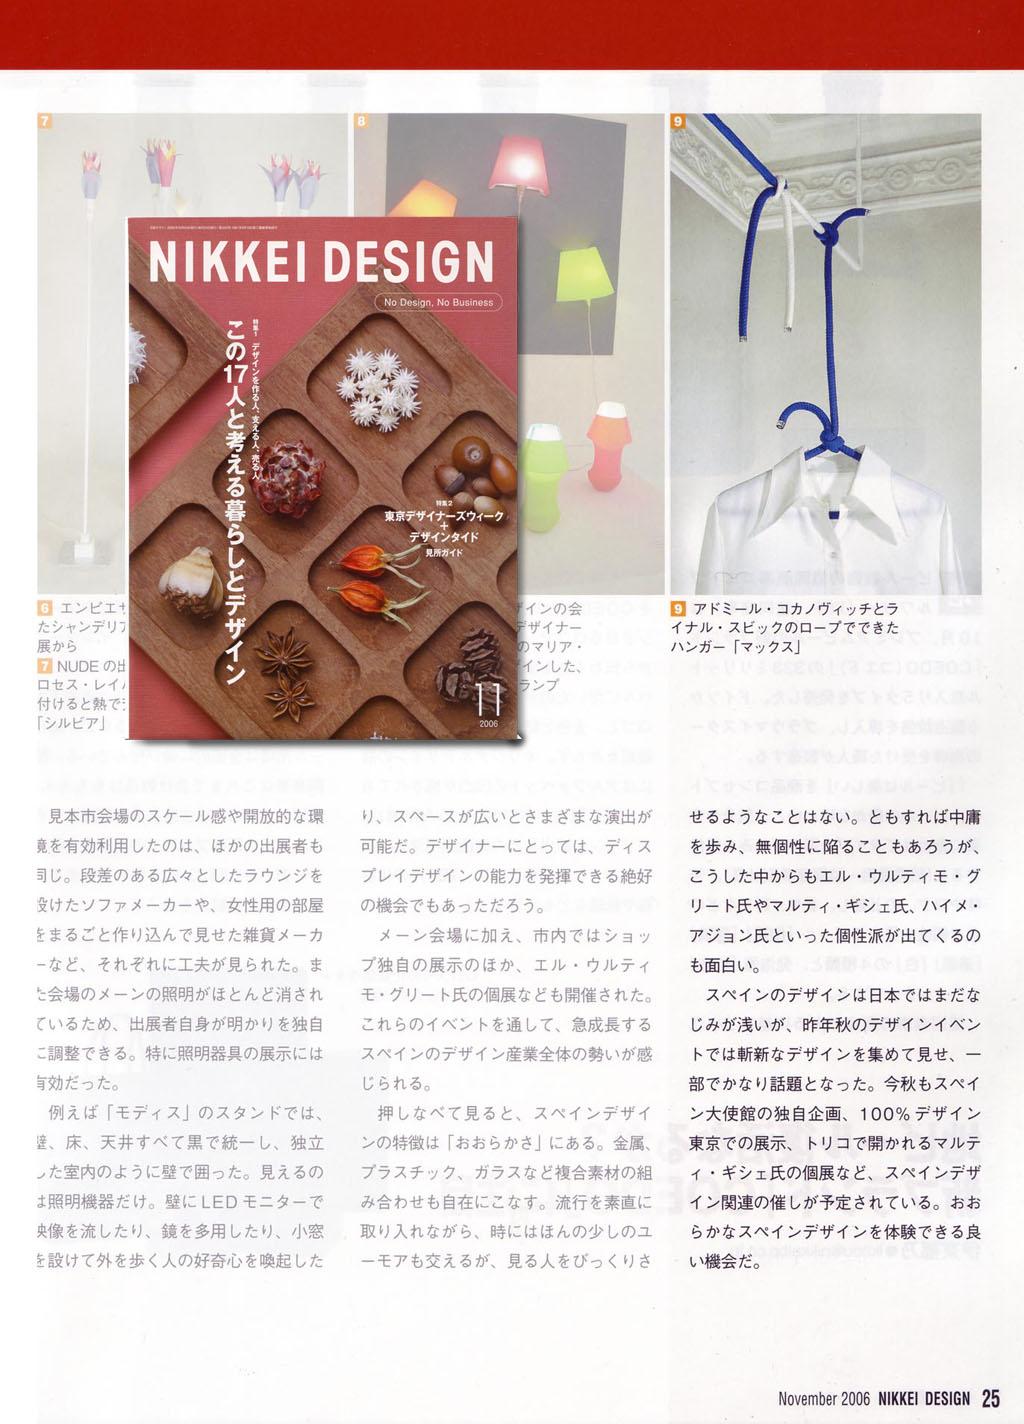 NIKKEI_DESING2 copy